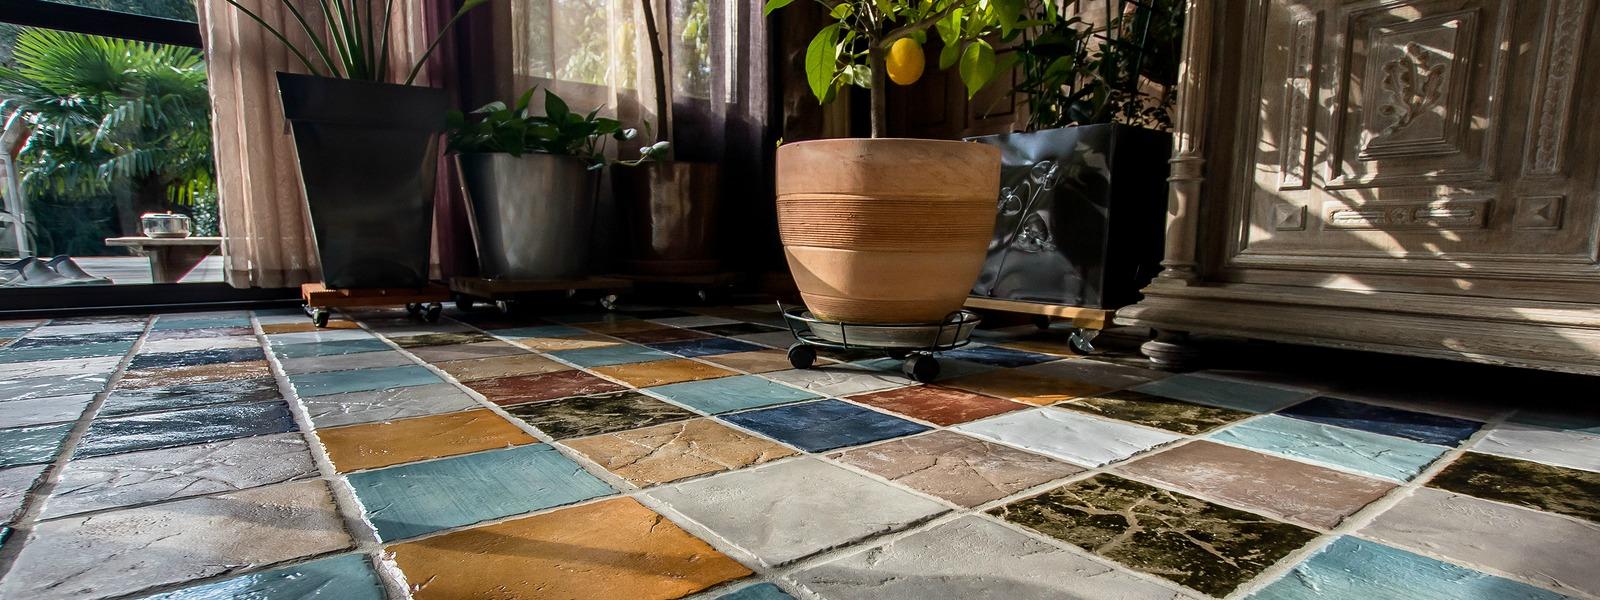 Austin flooring carpet tile stone hardwood flohr colorful tiles luxury bedroom with hardwood flooring dailygadgetfo Image collections